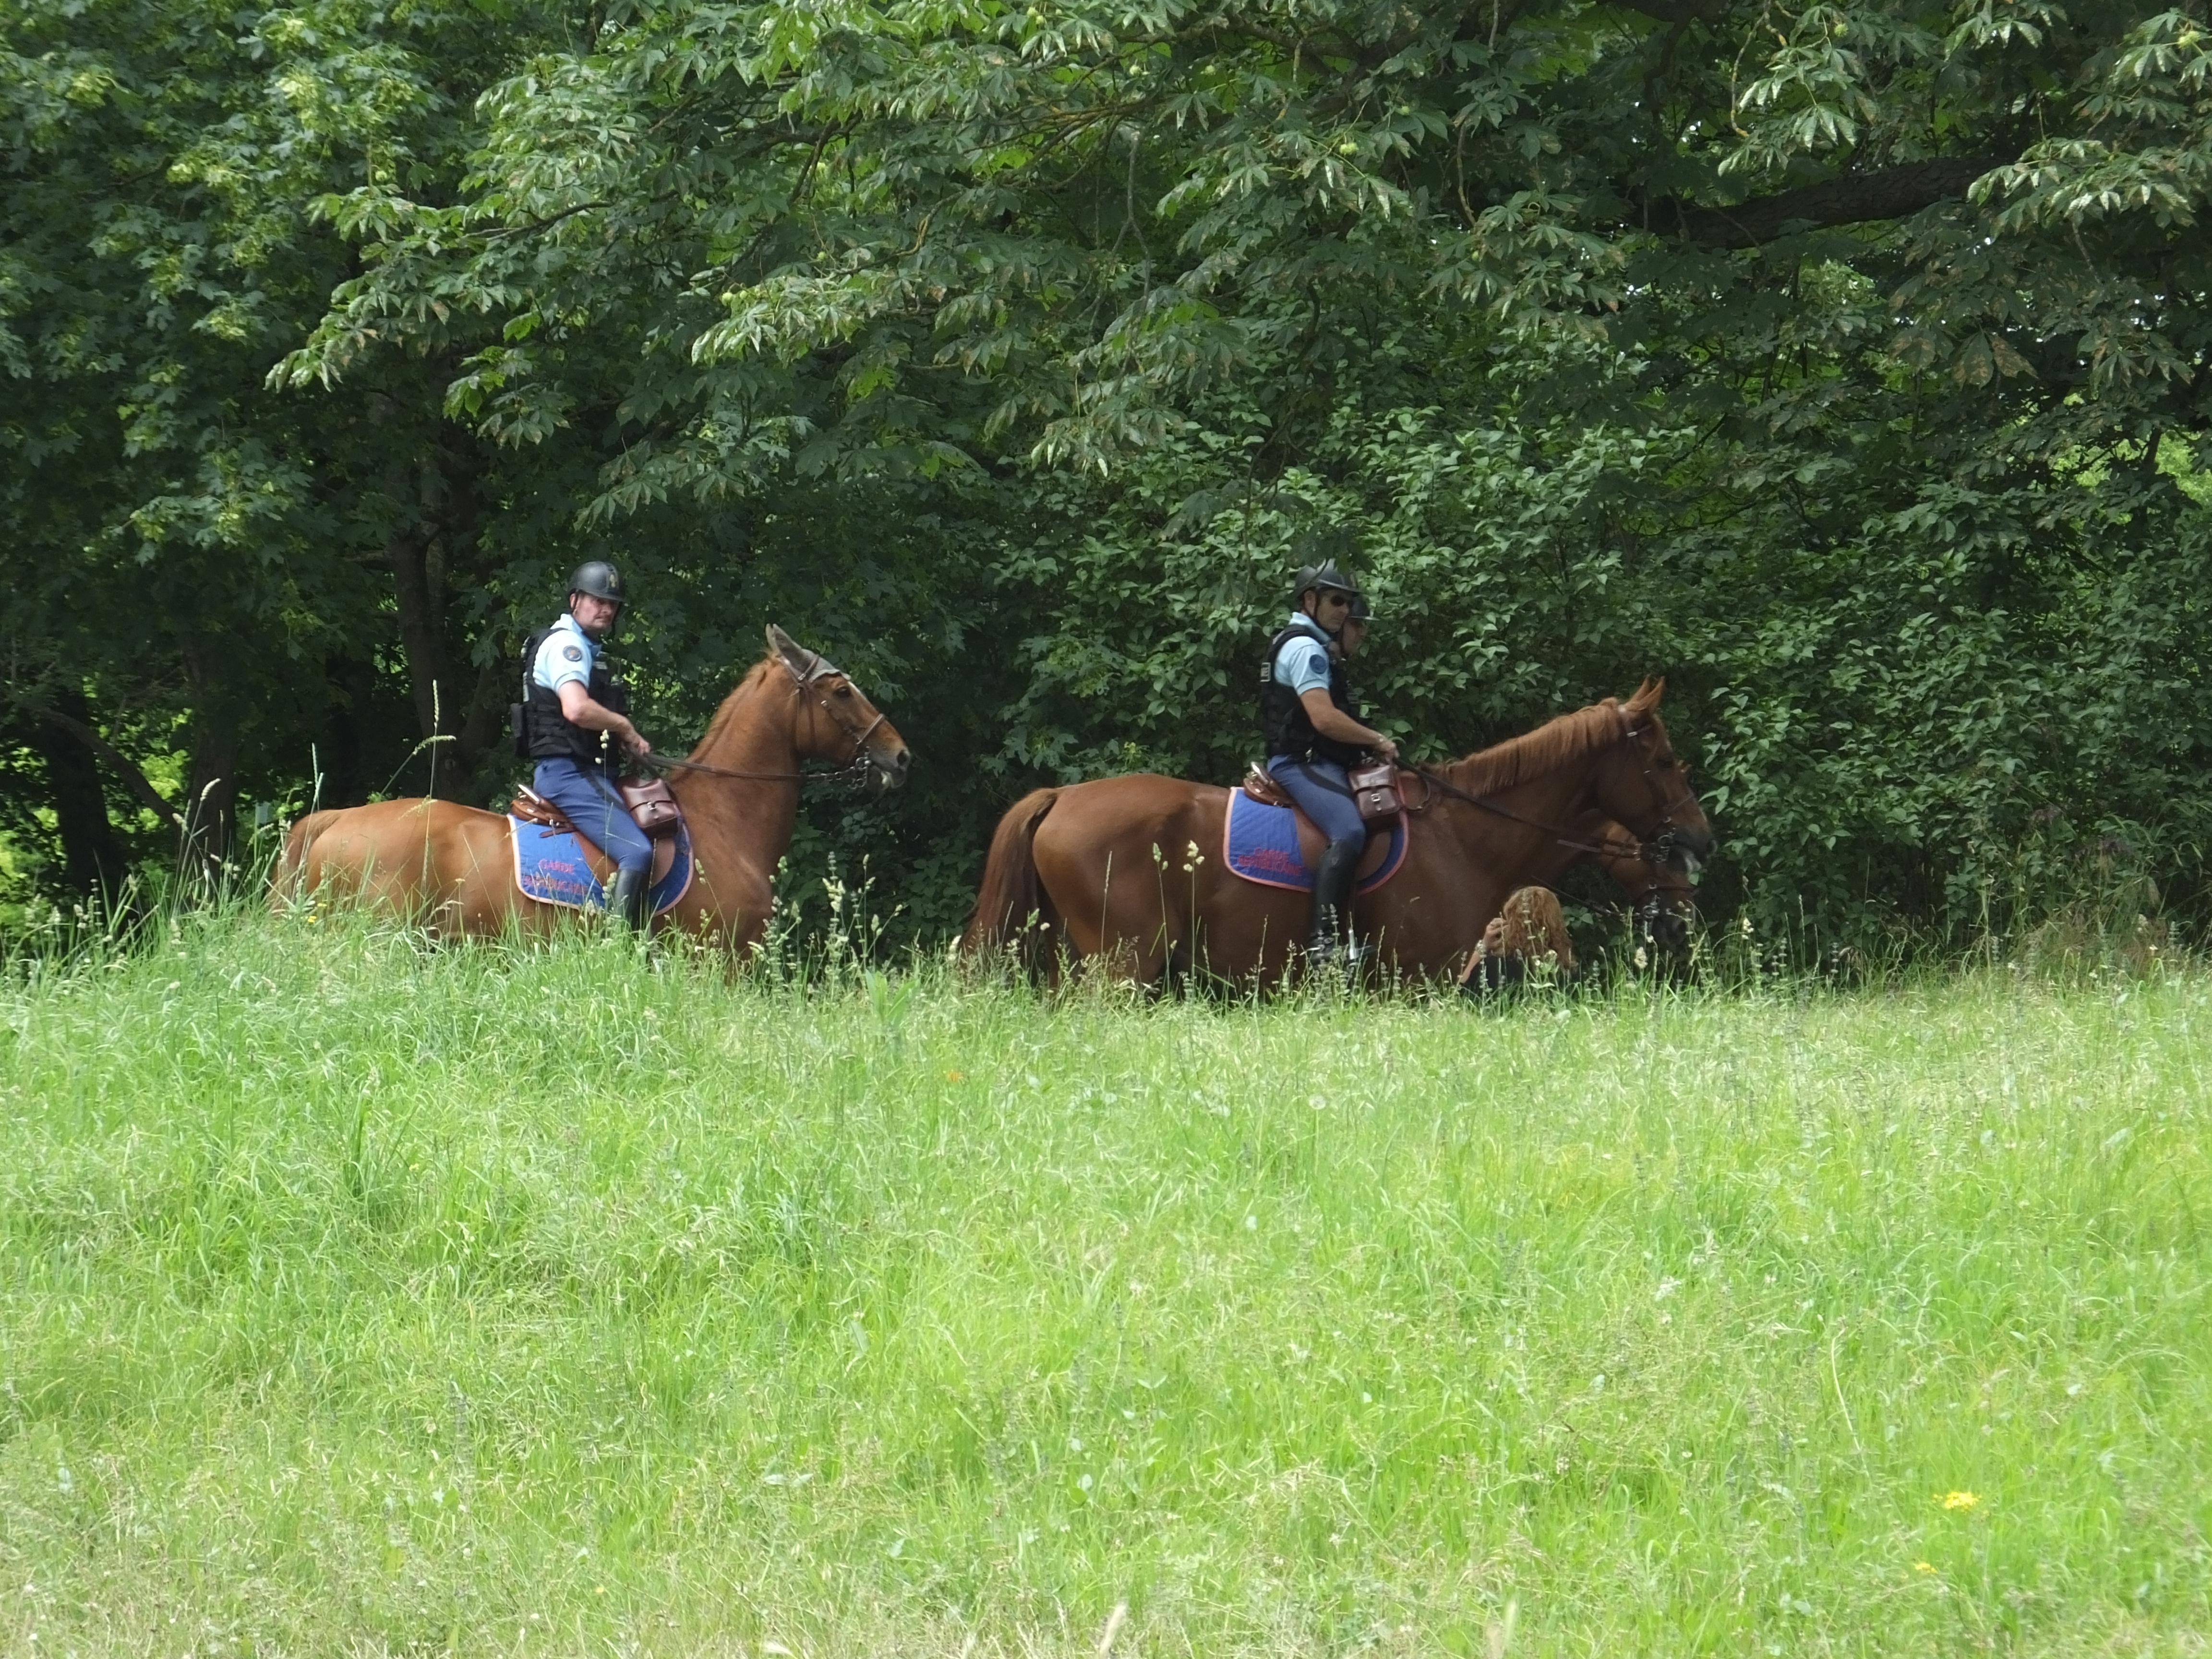 Caught the gendarmes on horseback as we were leaving.